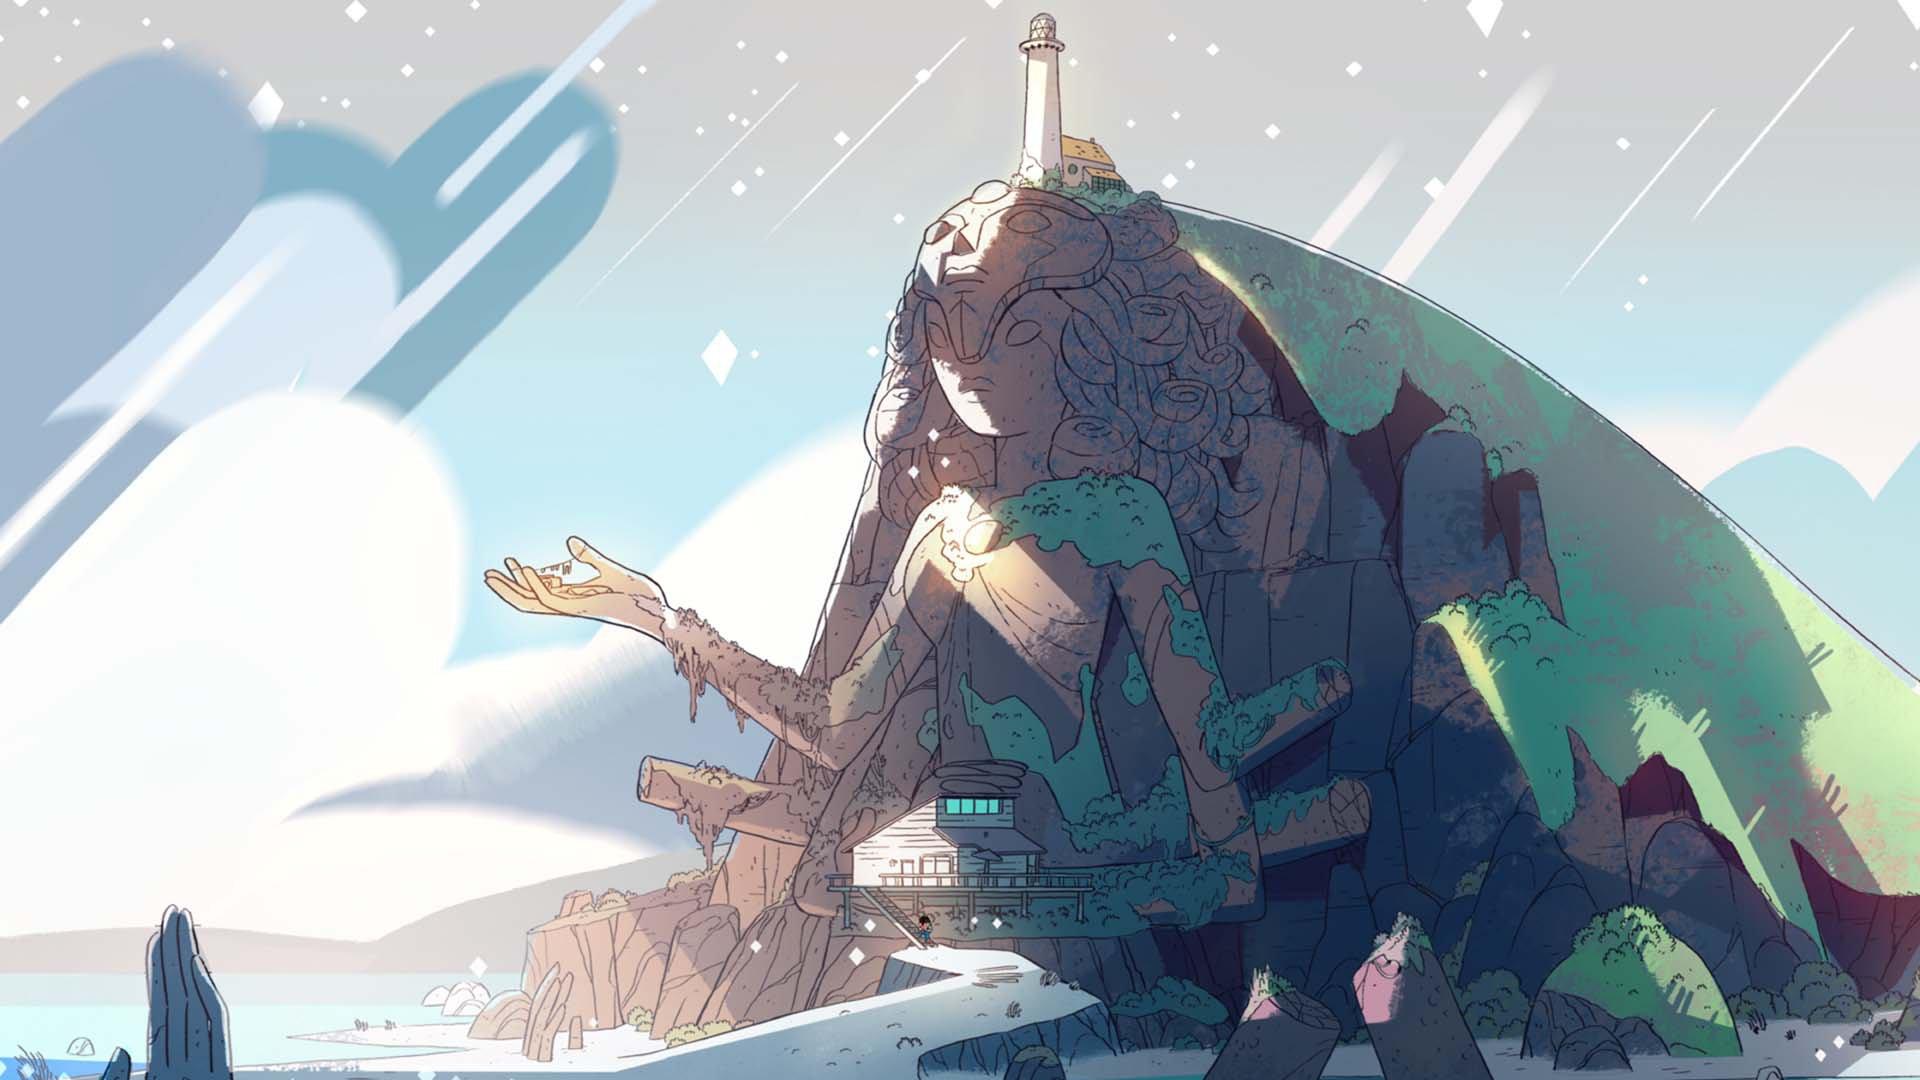 Aesthetic Enforcement Togetherness In Steven Universe